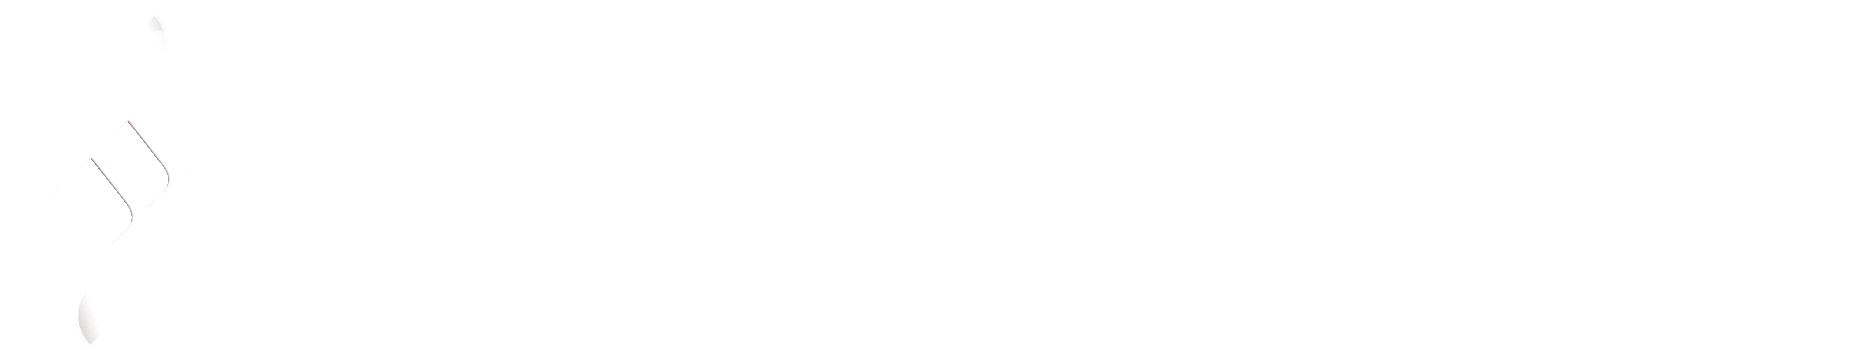 Karma Consult